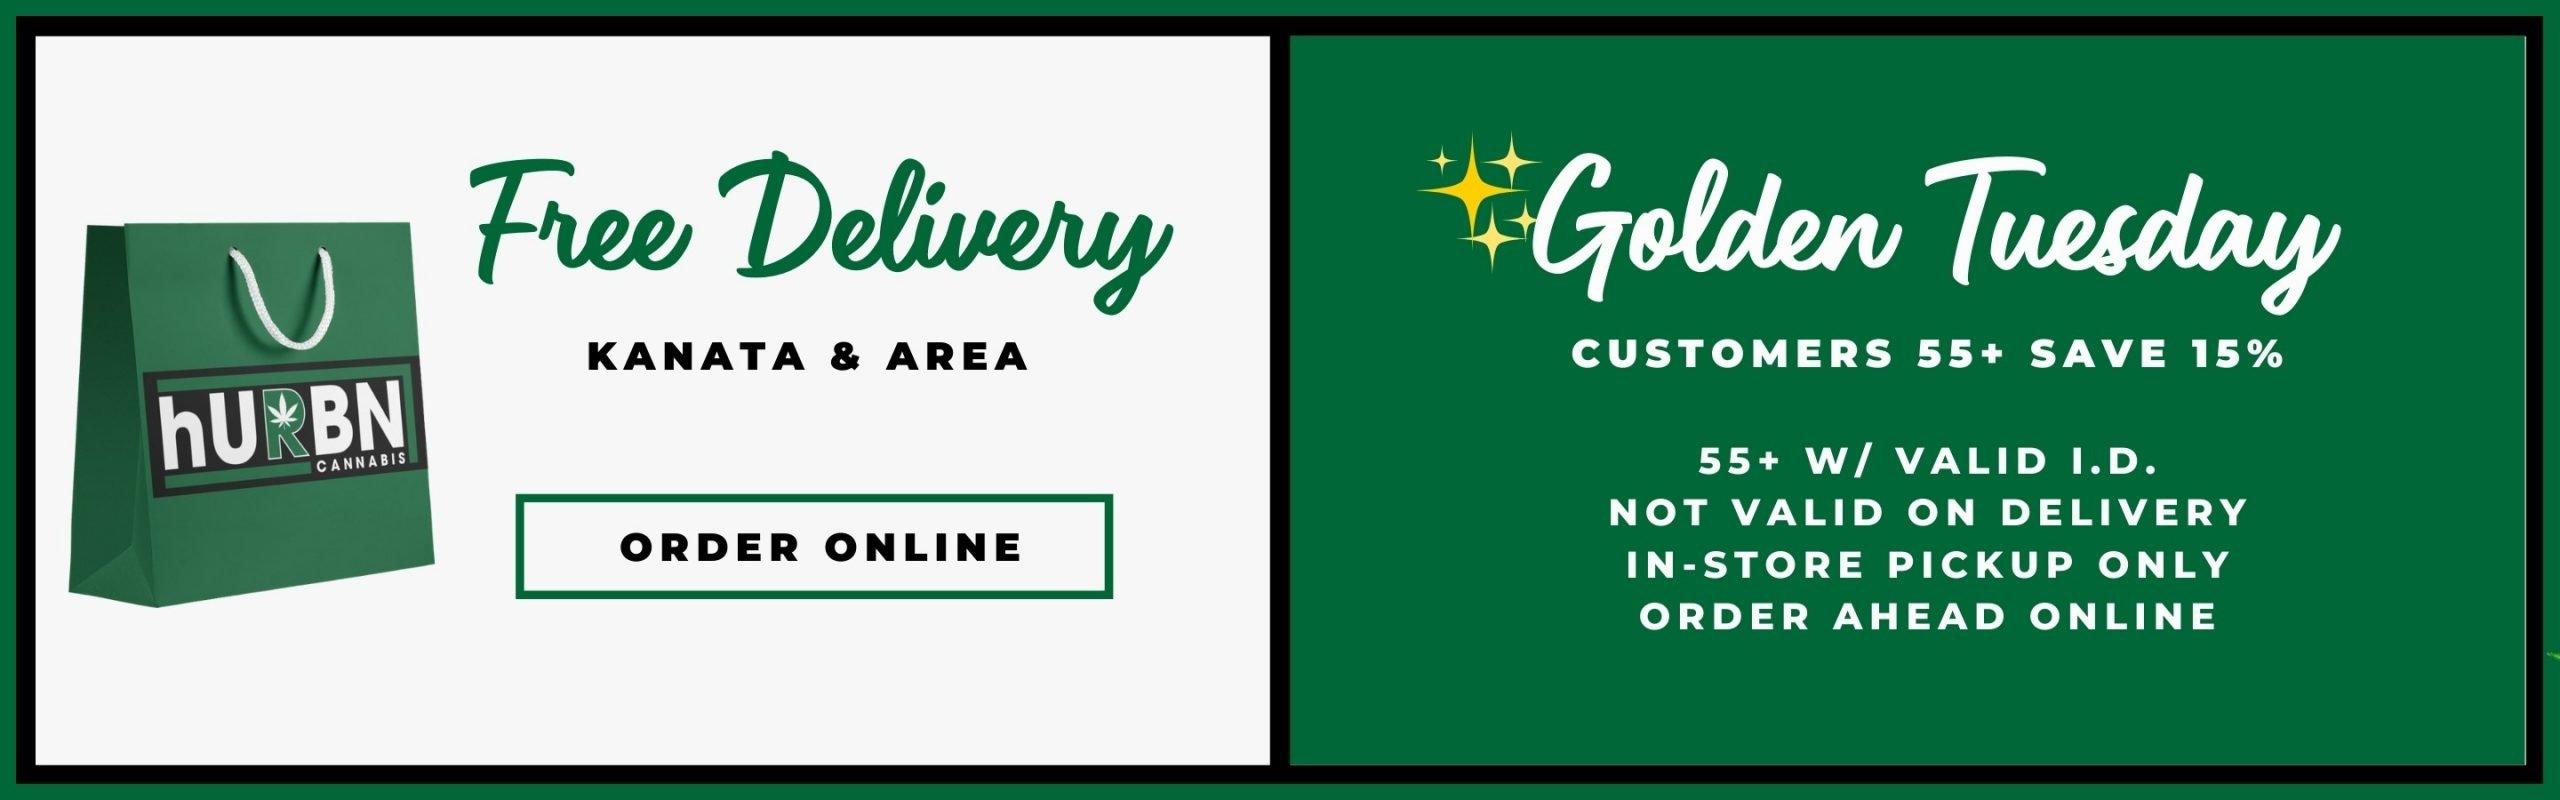 Free Delivery Kanata Cannabis